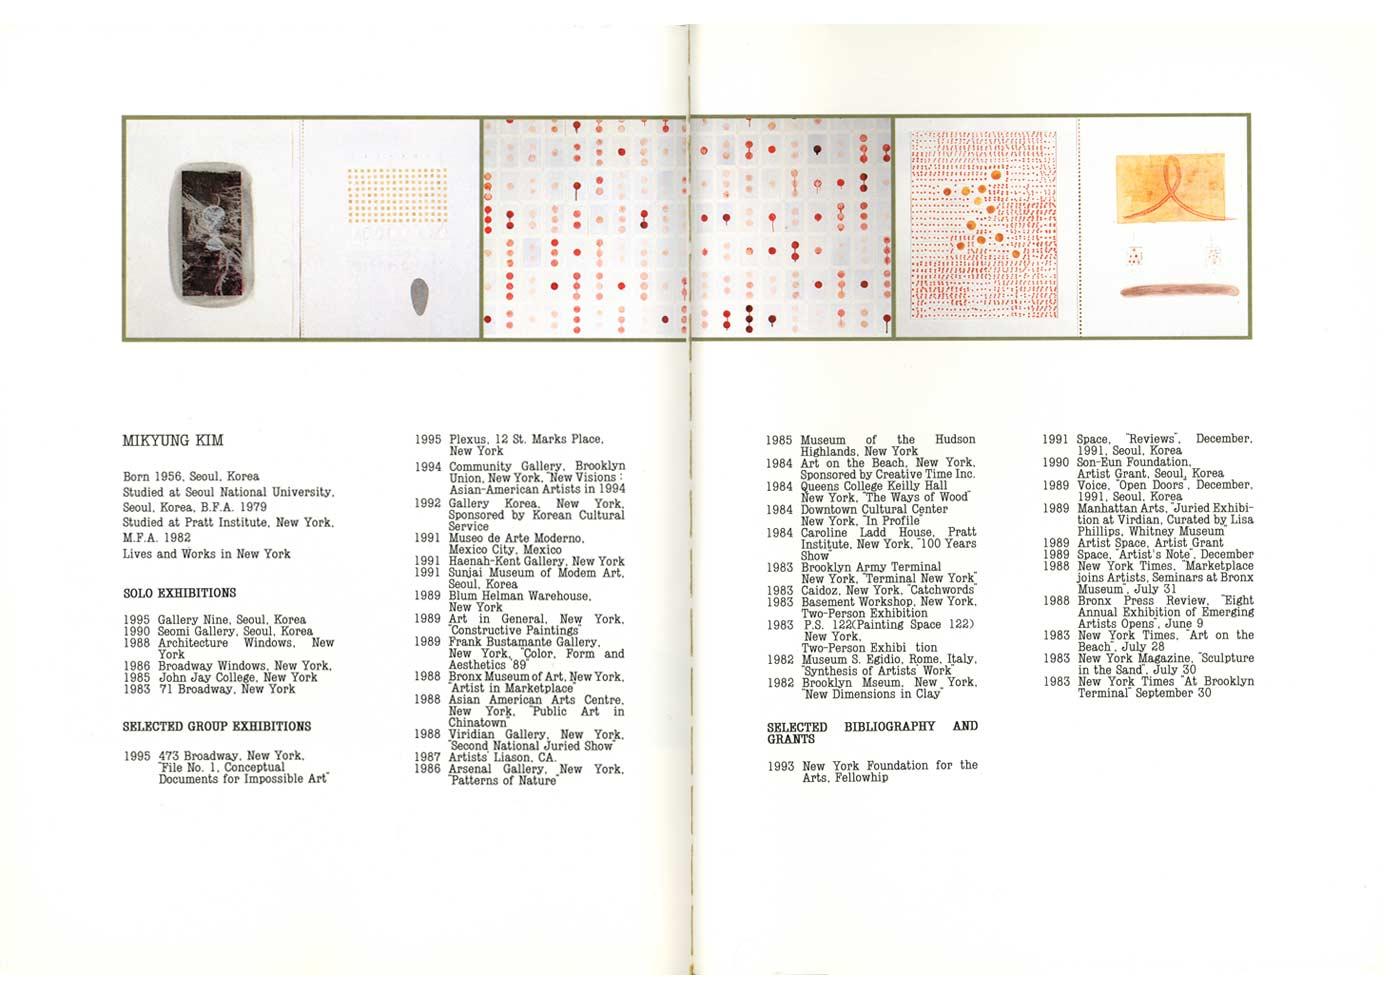 Mikyung Kim, catalog, biography